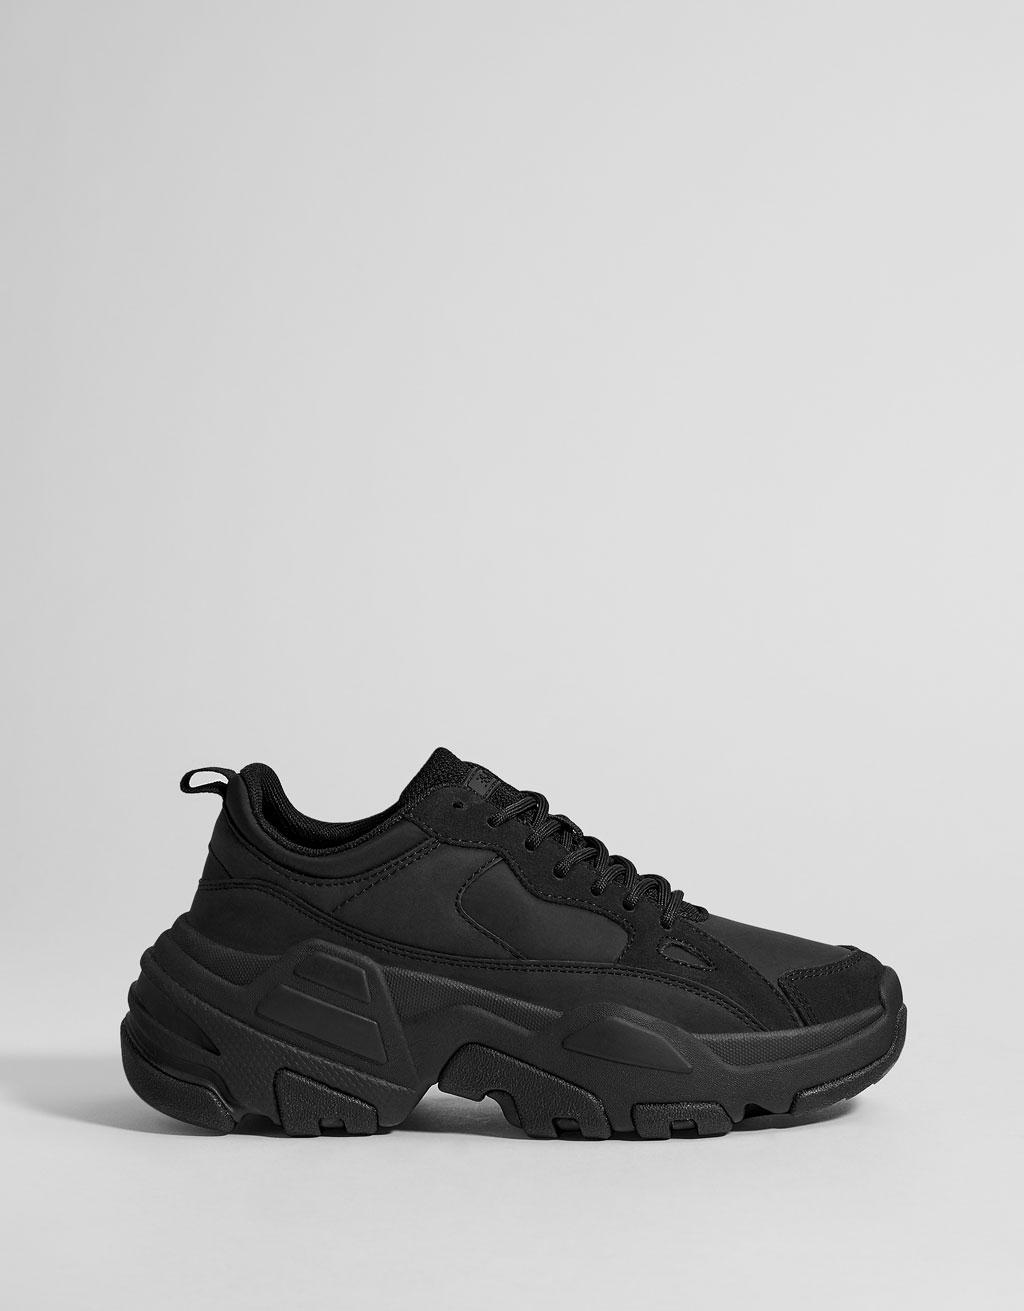 Lírico temerario Cambiable  46 euros - Talla 43 | Svarta skor, Skor, Dam sneakers